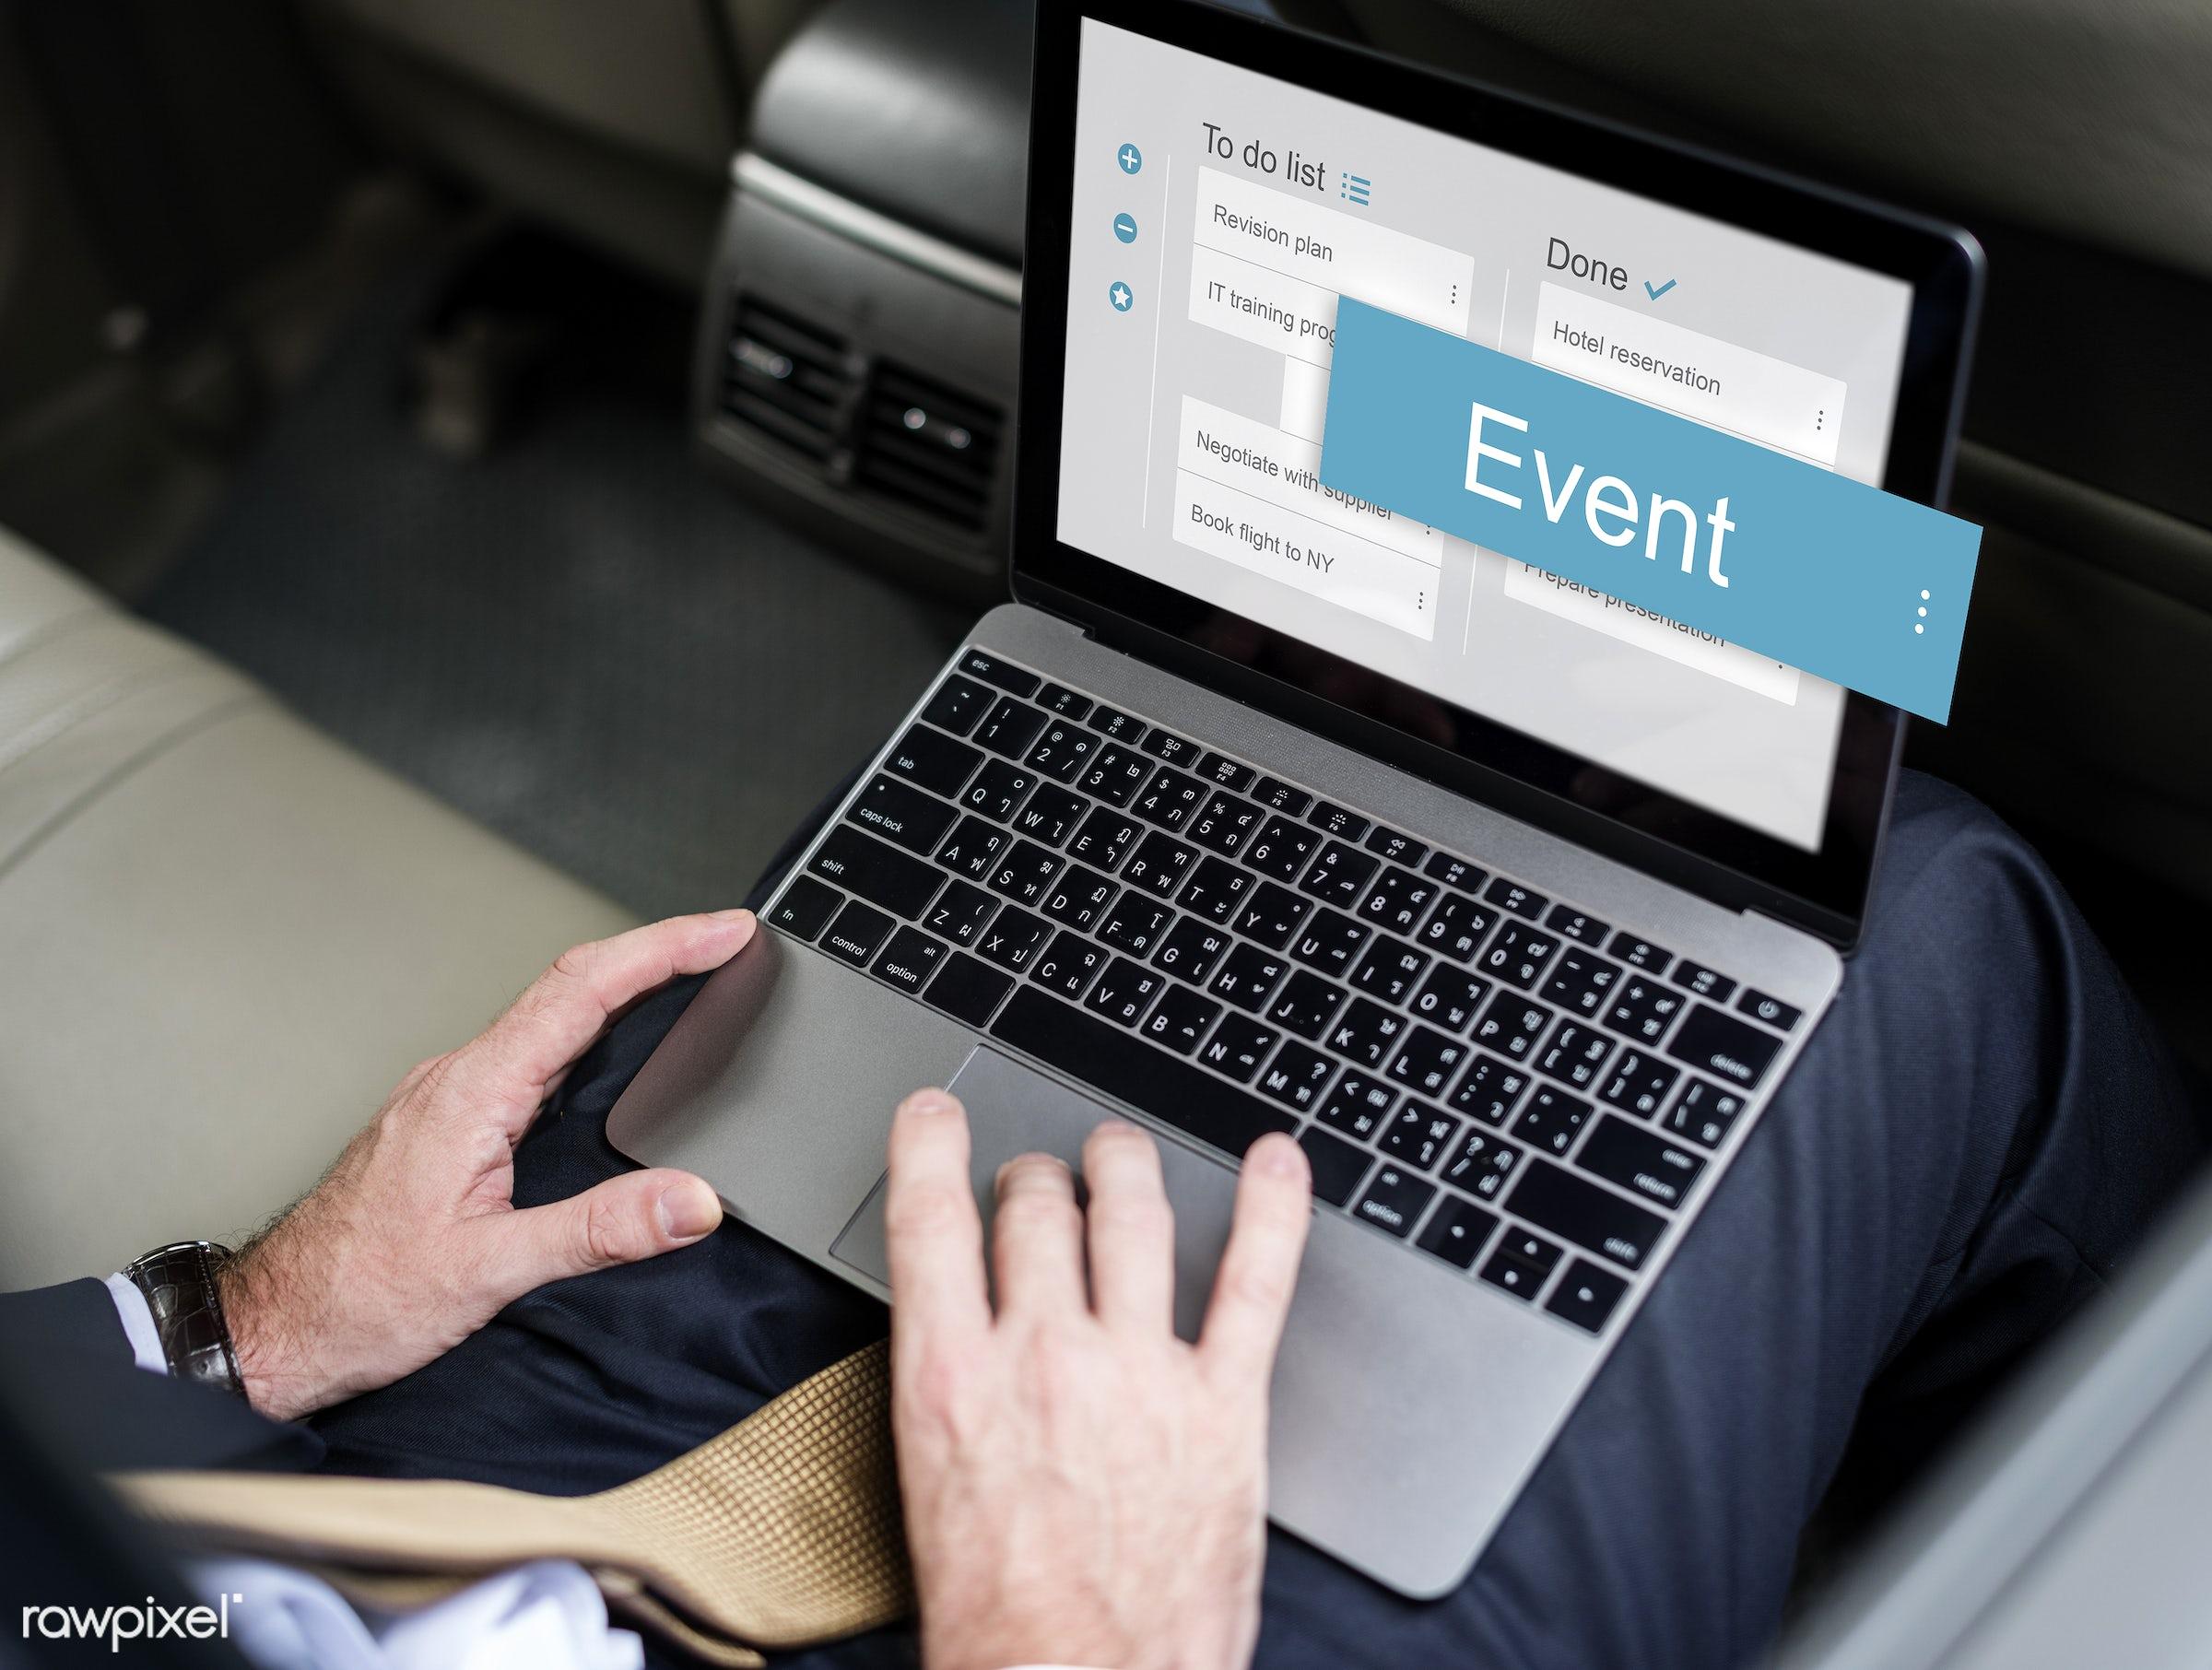 agenda, app, appointment, business, calendar, checklist, corporate, digital, events, interface, list, management, organize,...